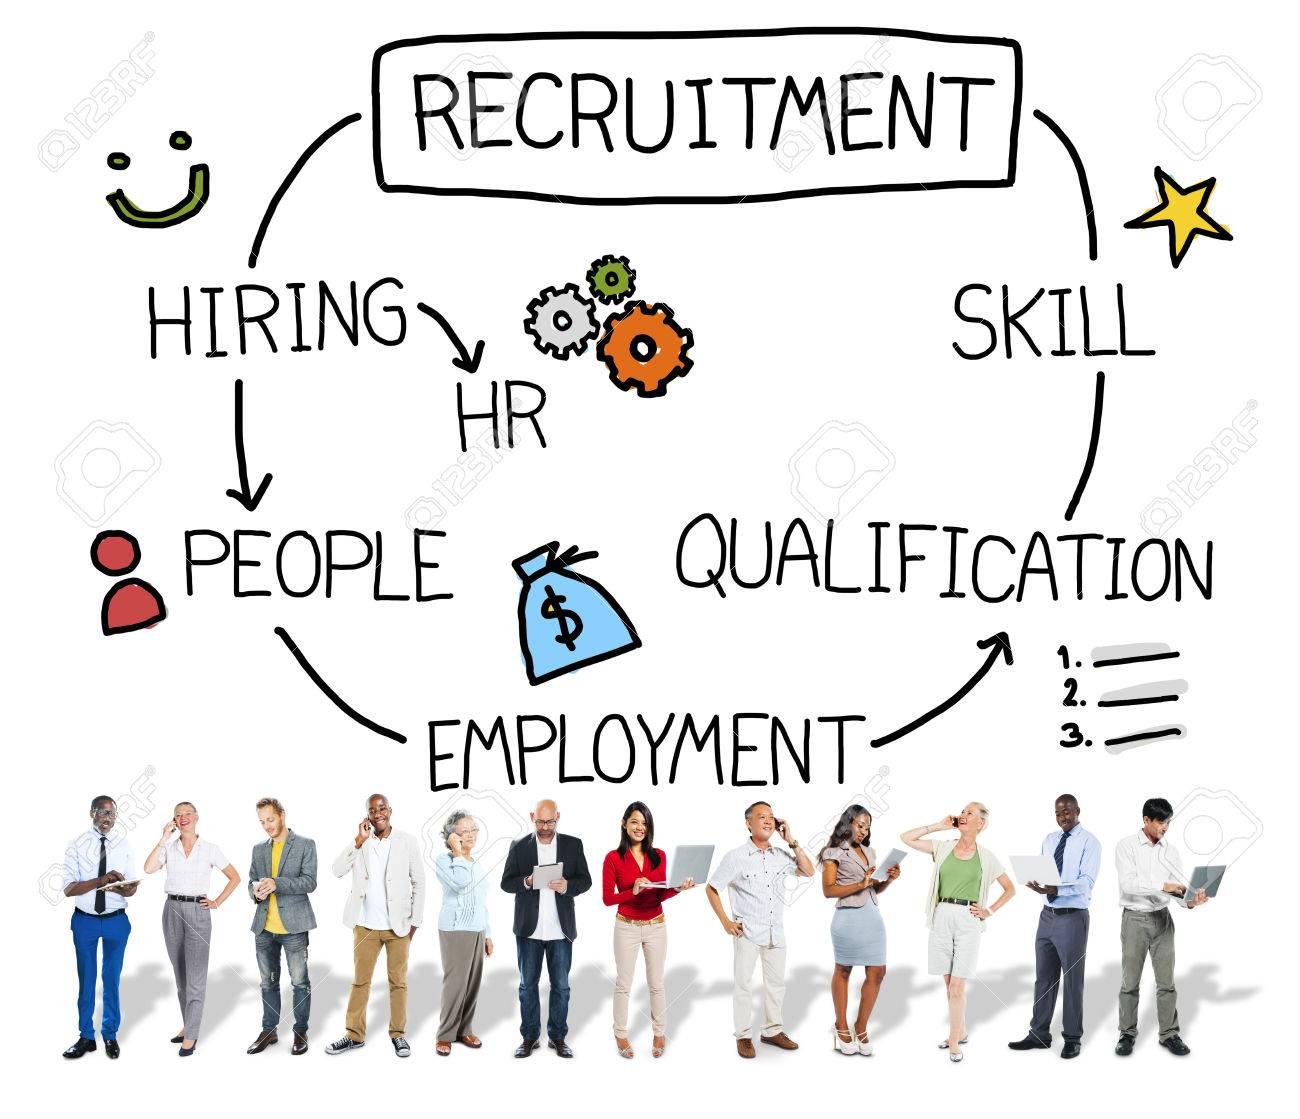 recruitment hiring skill qualification job concept stock photo recruitment hiring skill qualification job concept stock photo 42883237